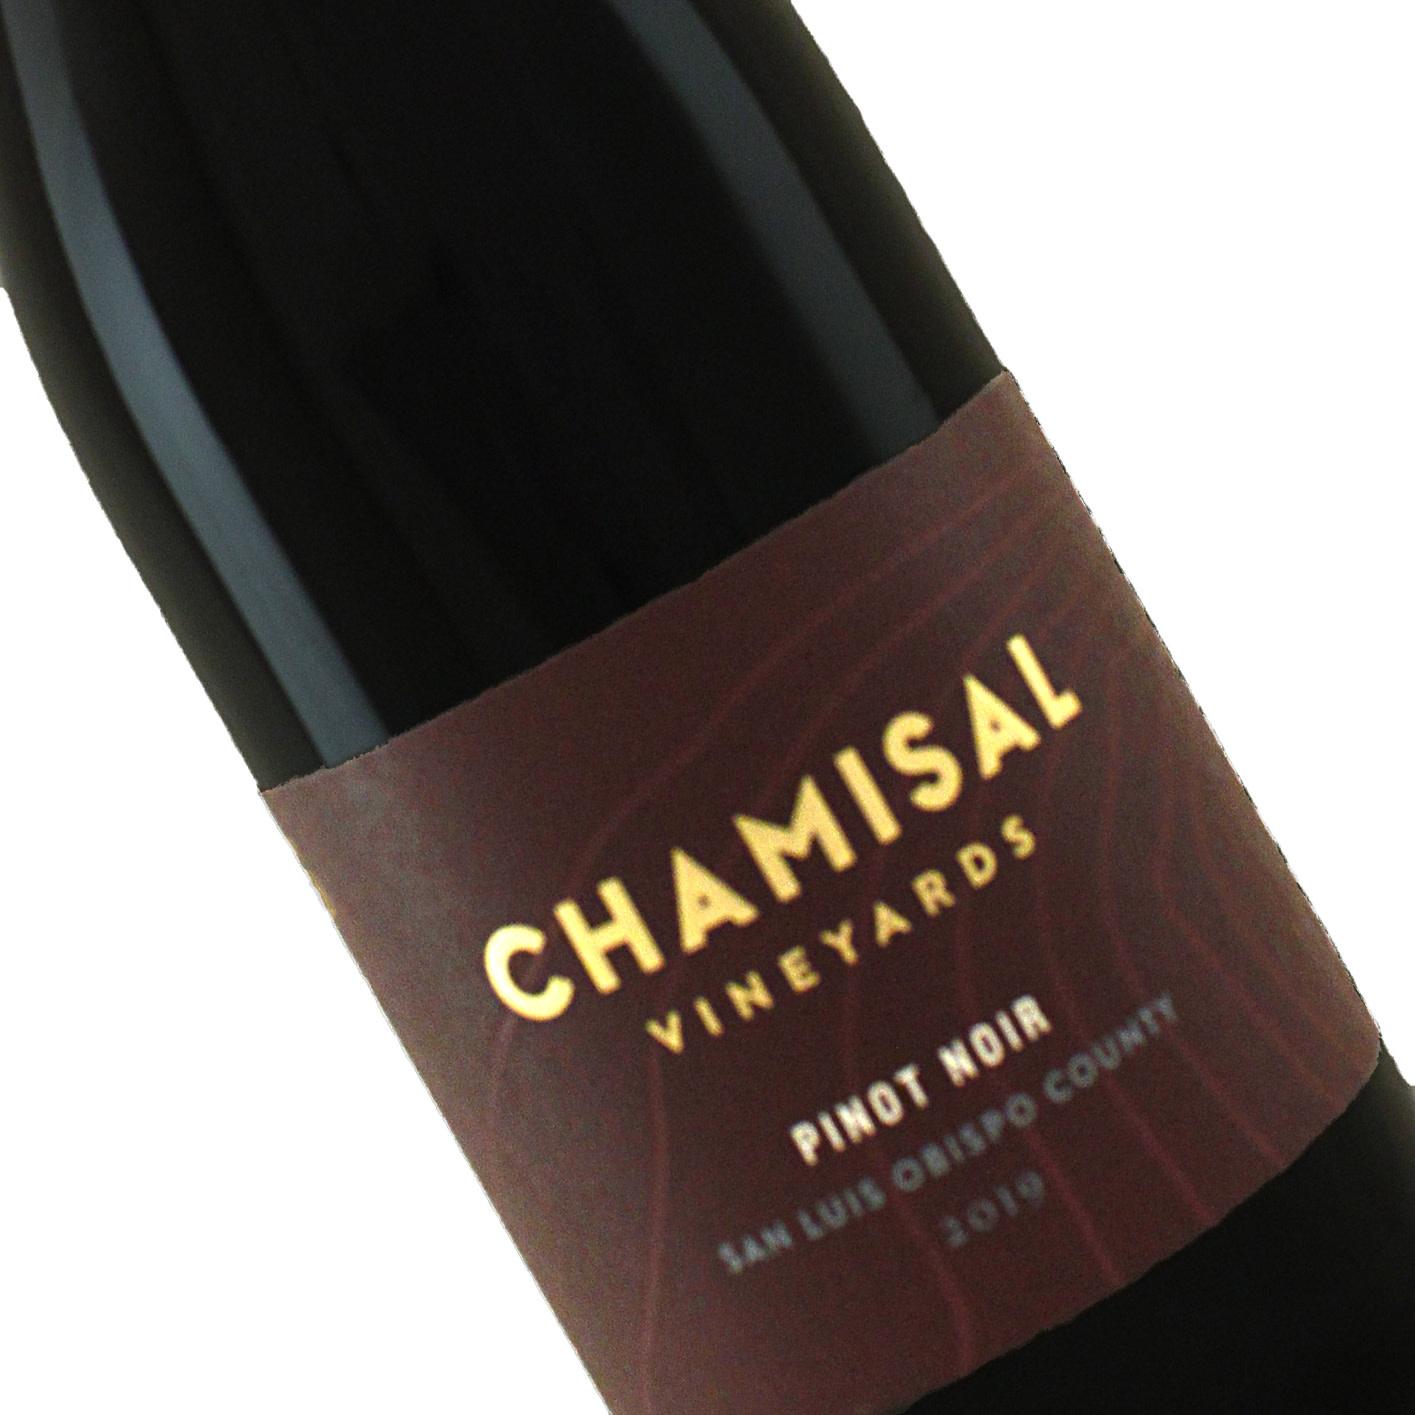 Chamisal 2019 Pinot Noir San Luis Obispo County